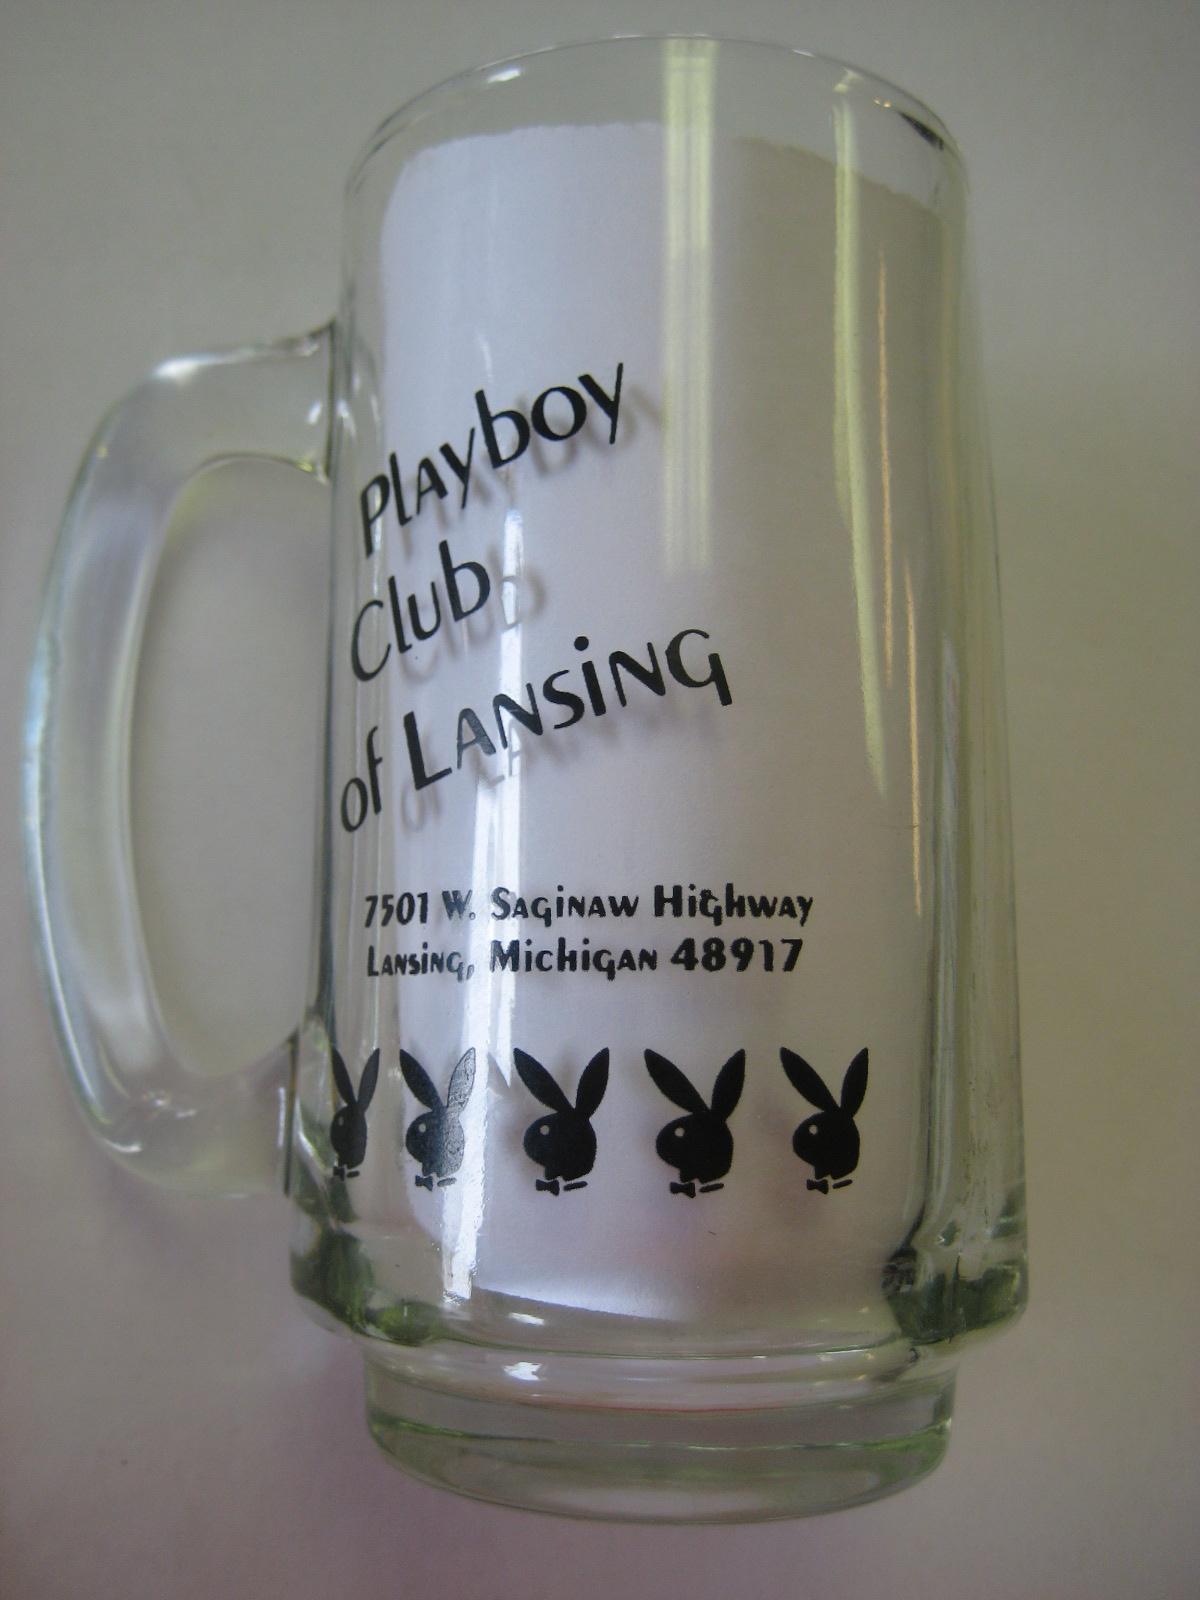 Playboy Club of Lansing Clear Mug